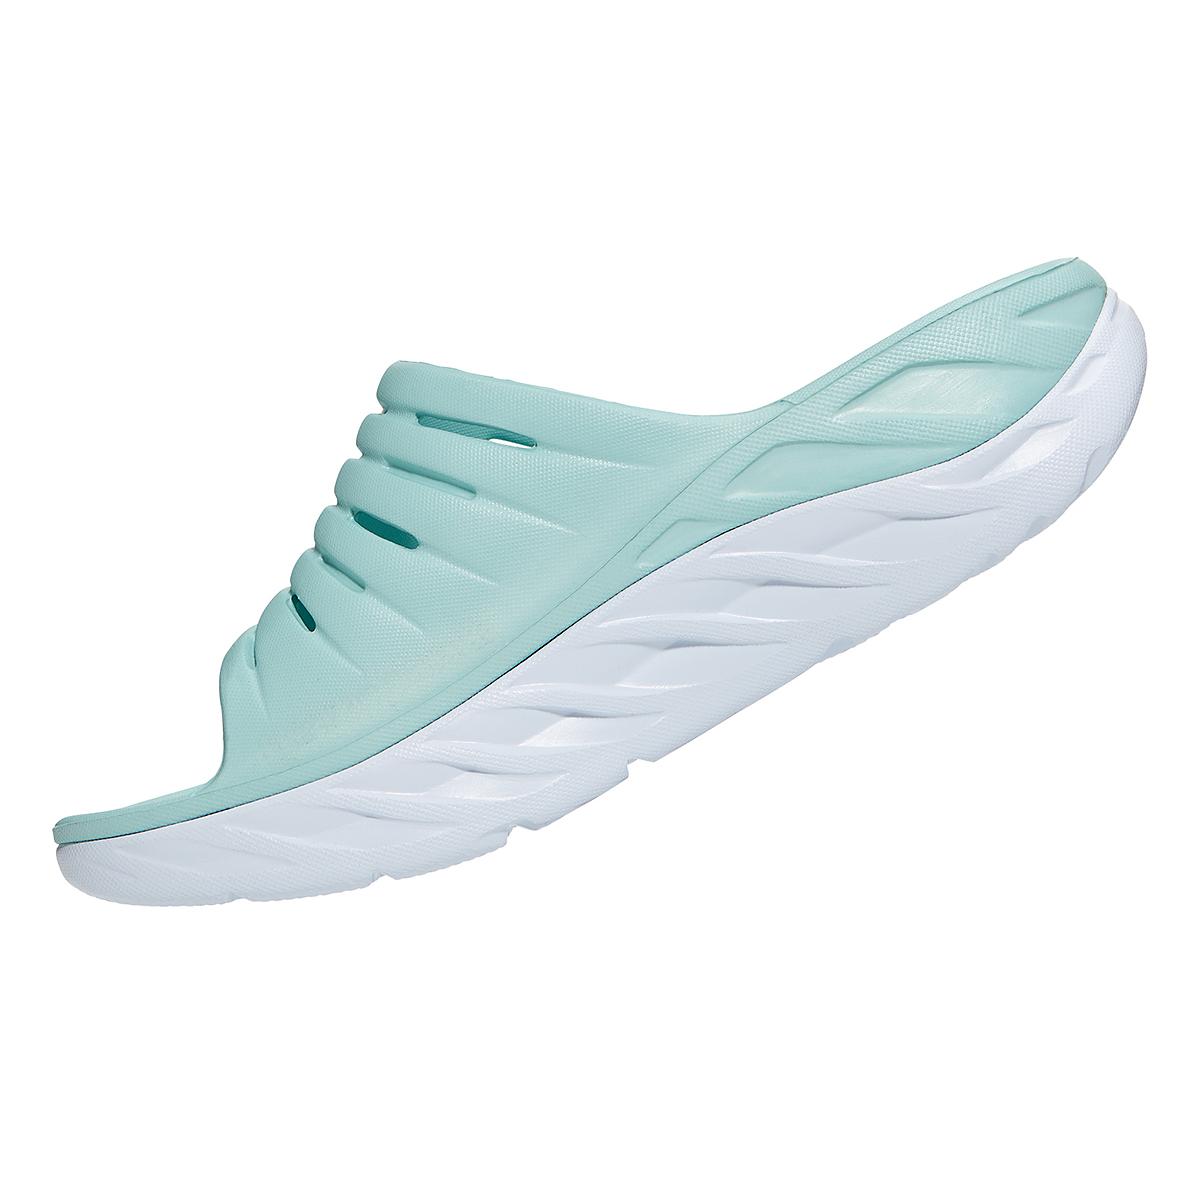 Women's Hoka One One Ora Recovery Slide - Color: Eggshell Blue/White - Size: 5 - Width: Regular, Eggshell Blue/White, large, image 4